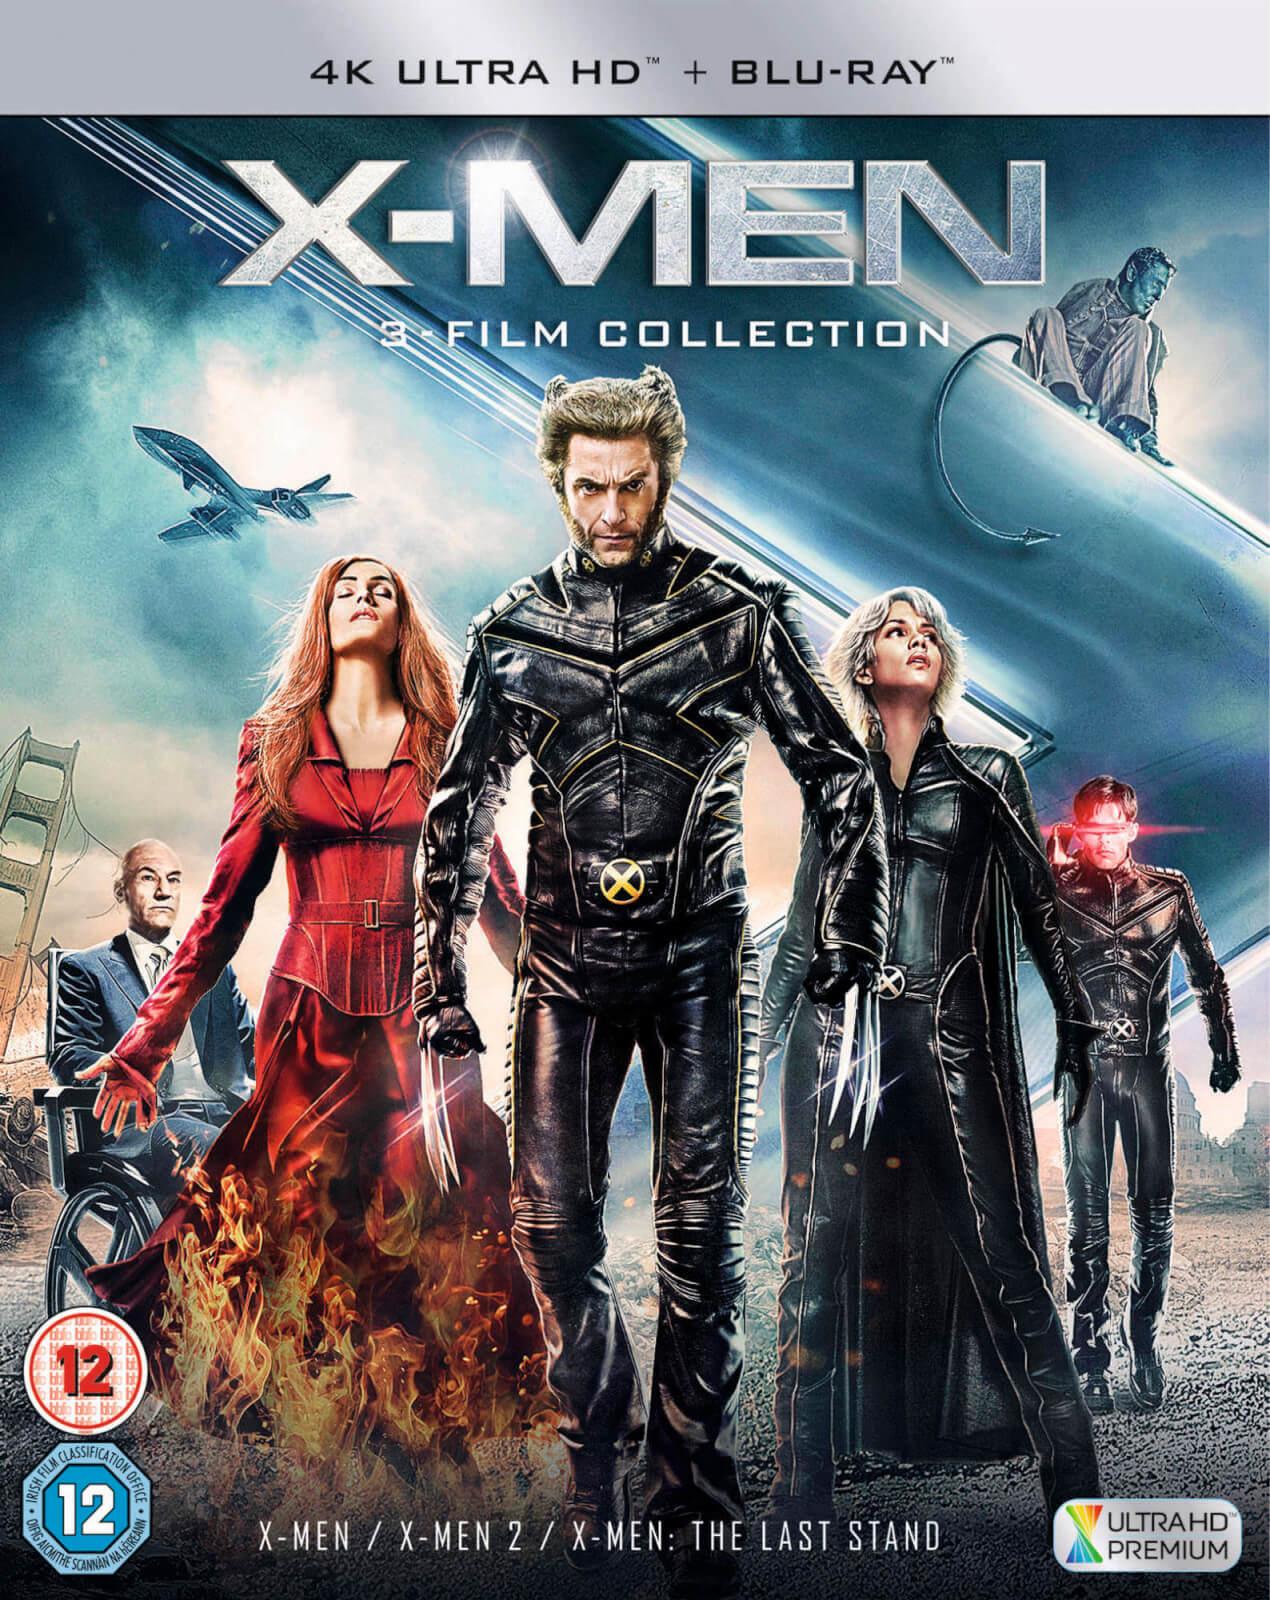 Coffret Blu-ray X-Men Trilogy : X-Men + X2: X-Men United + X-Men: The Last Stand (4K Ultra HD + Blu-ray)